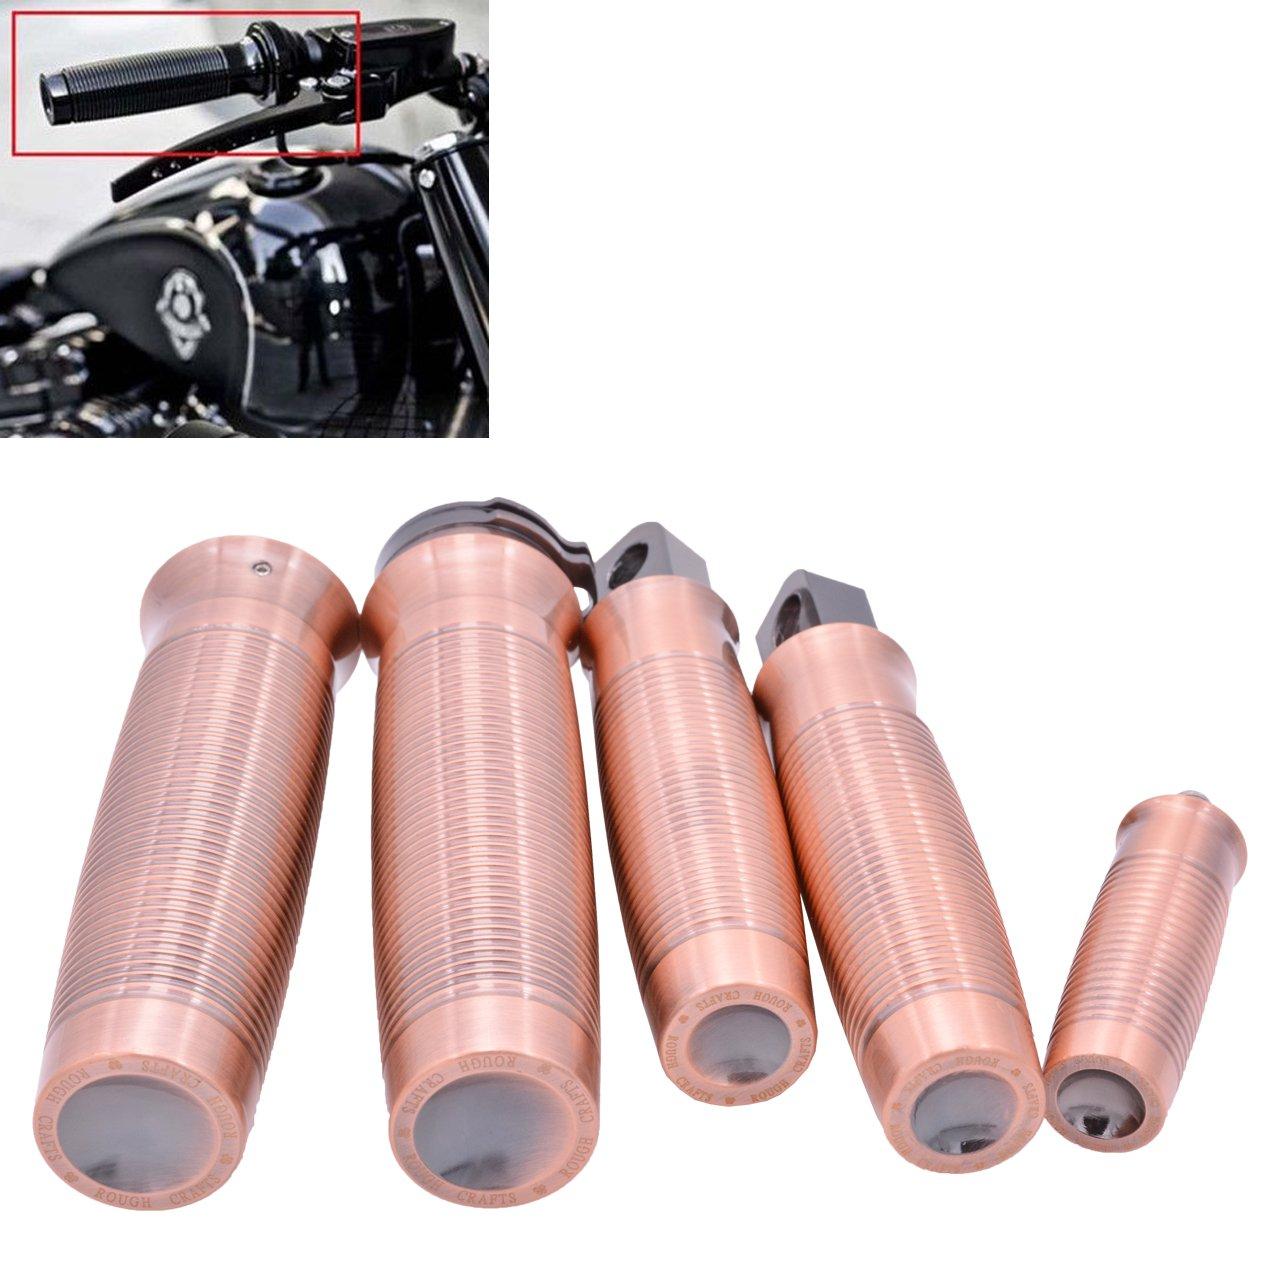 HFP-389-HQU-PR KT 250 350 450 EXC-F SX-F XCF-W 690 Duke Enduro SMC Supermoto//Freeride 350//690 Duke 2008-2018 Motorcycle Fuel Pump w Installation Kit and Pressure Regulator 500 EXC XC-W